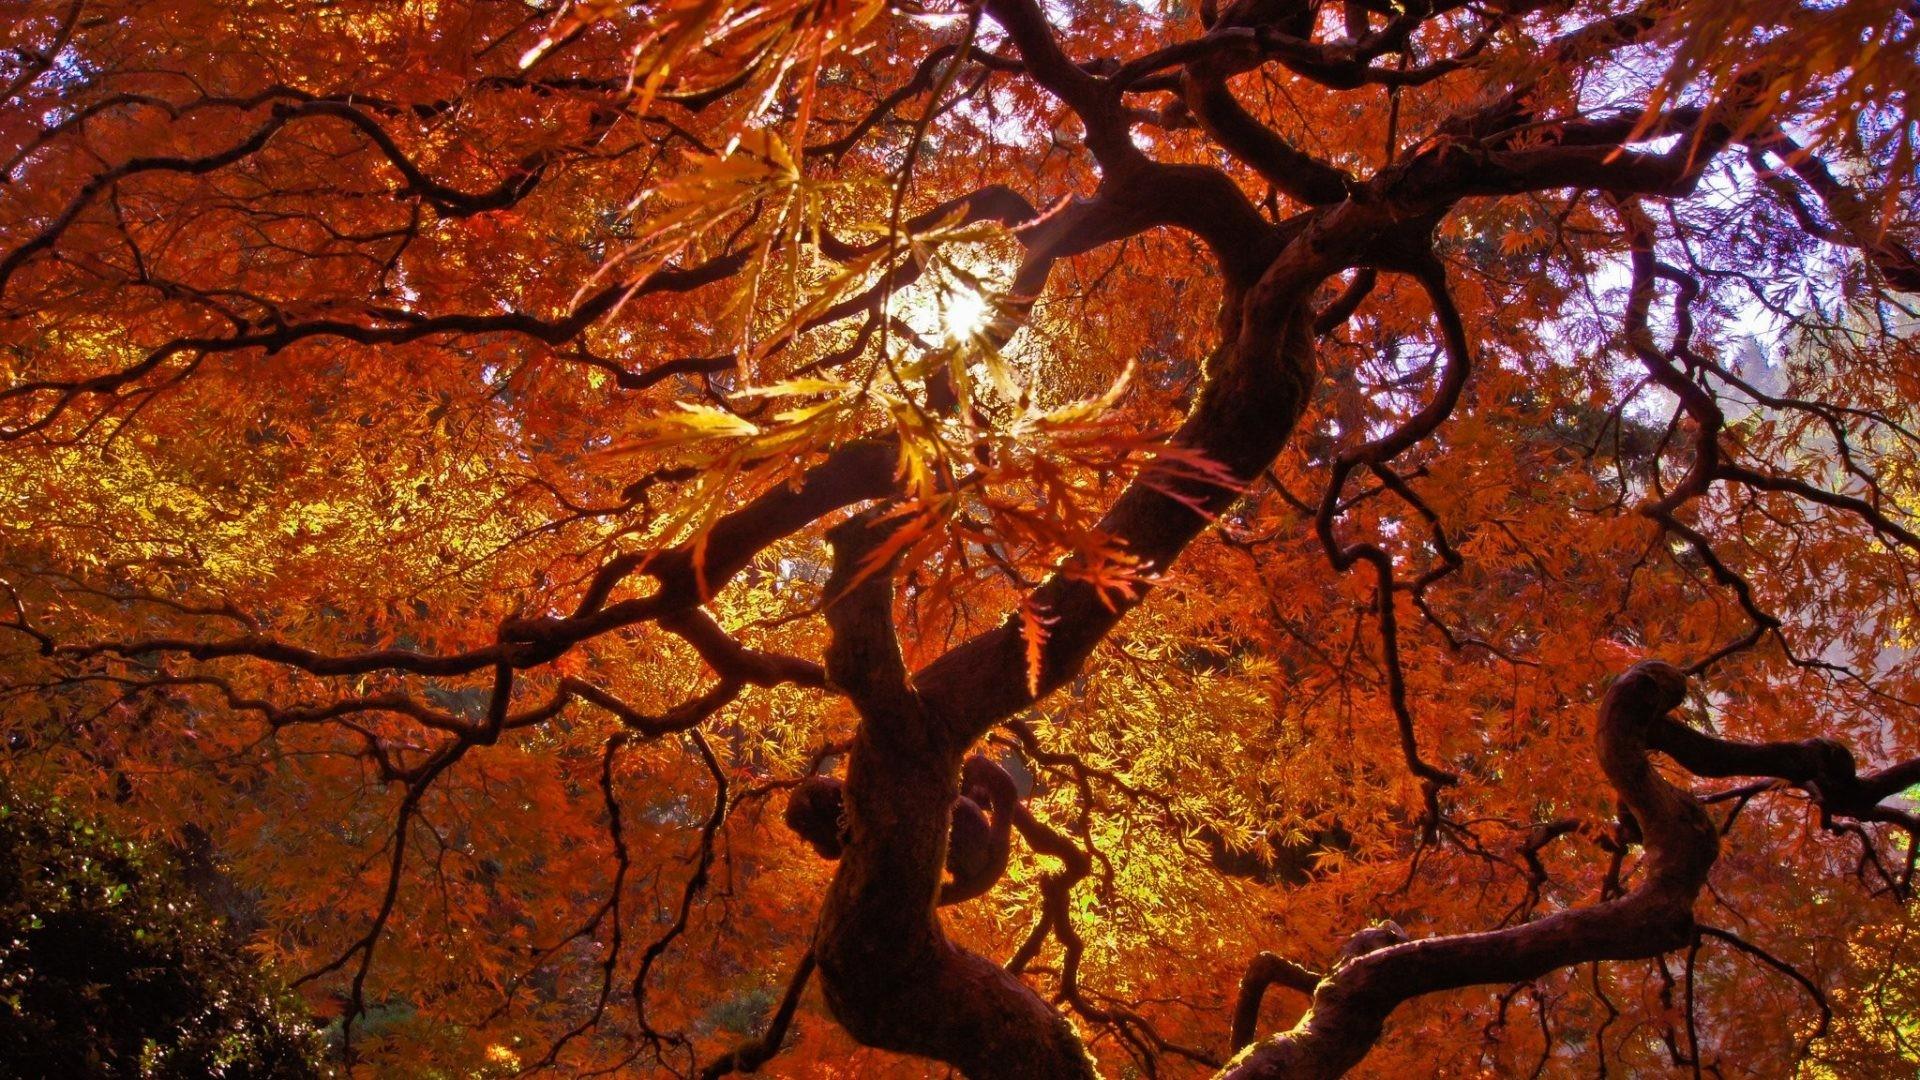 Automne Tag – Automne Nature Leaf Rain Tree Landscapes Fall Wet Season  Campaign Wallpaper Image Hd